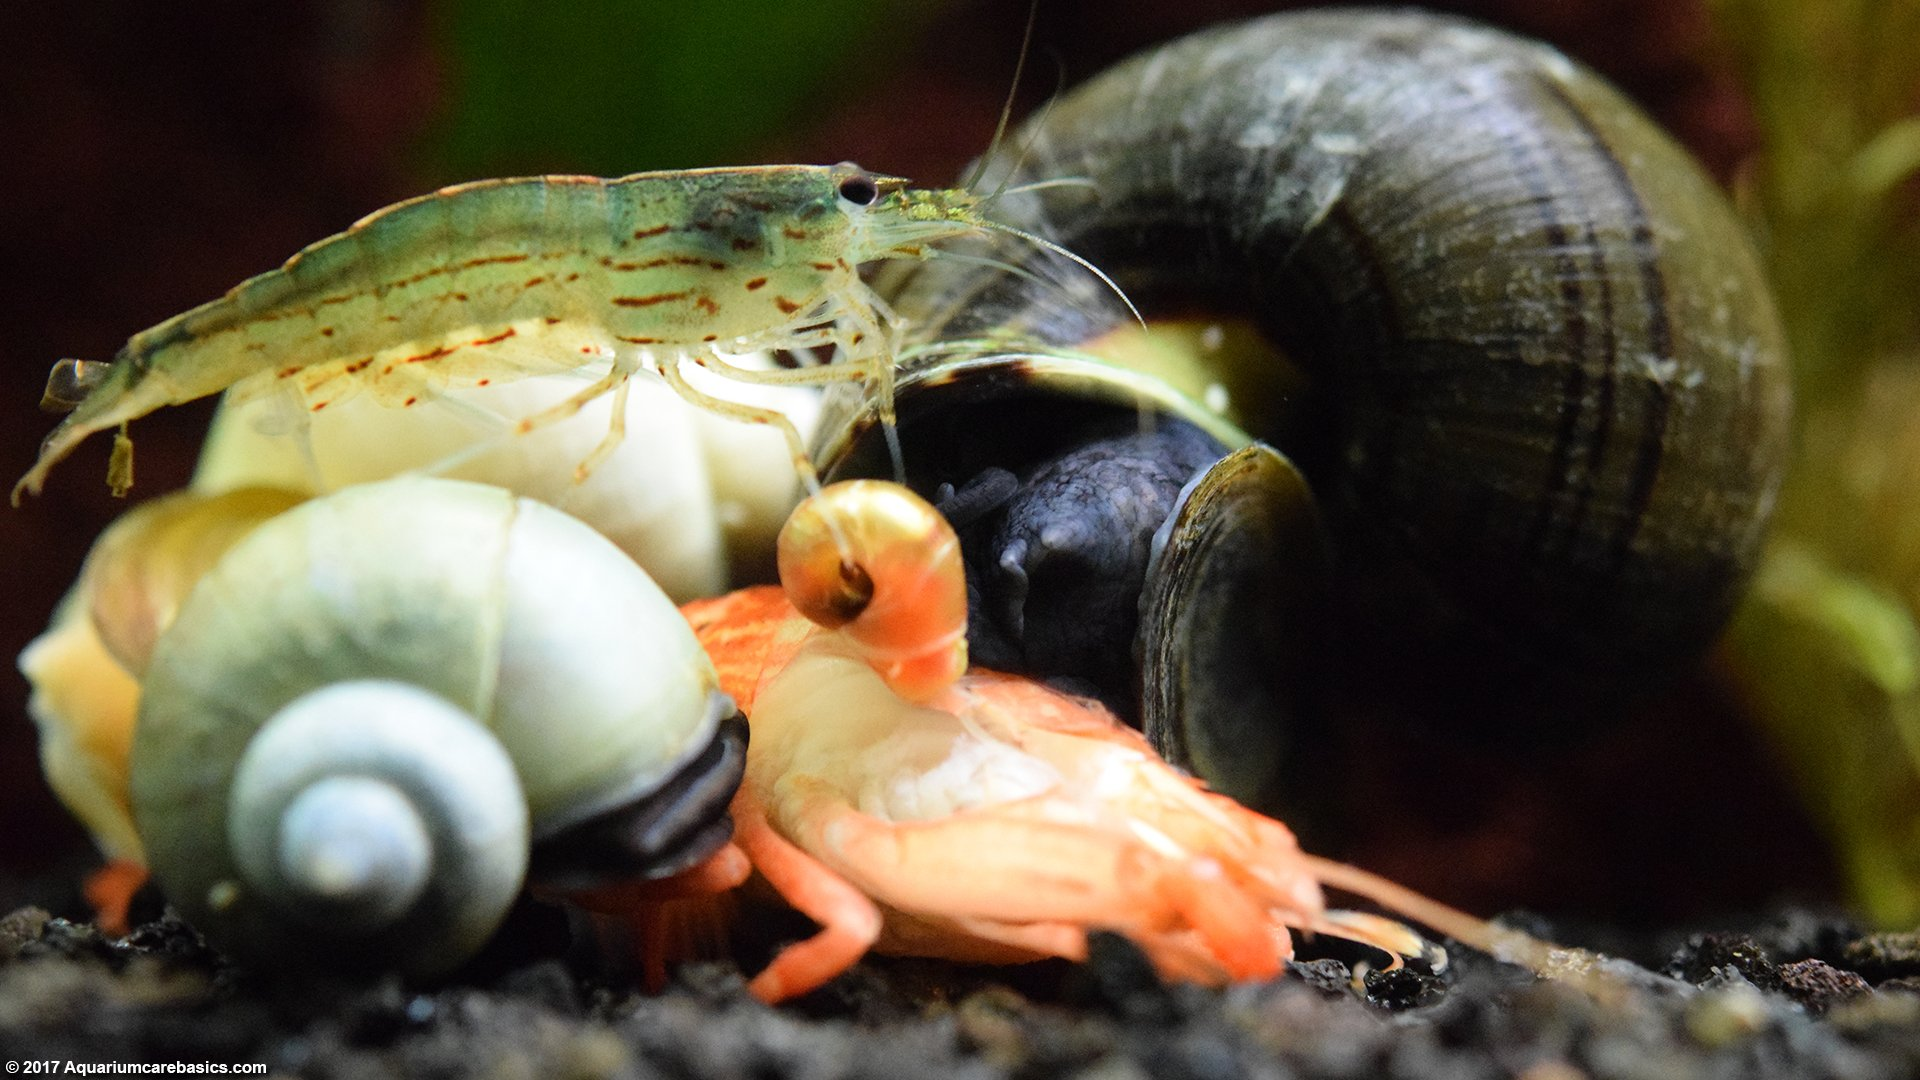 Bamboo Shrimp: Tank Mates, Food, Care, Feeding - VideoFreshwater Shrimp Care